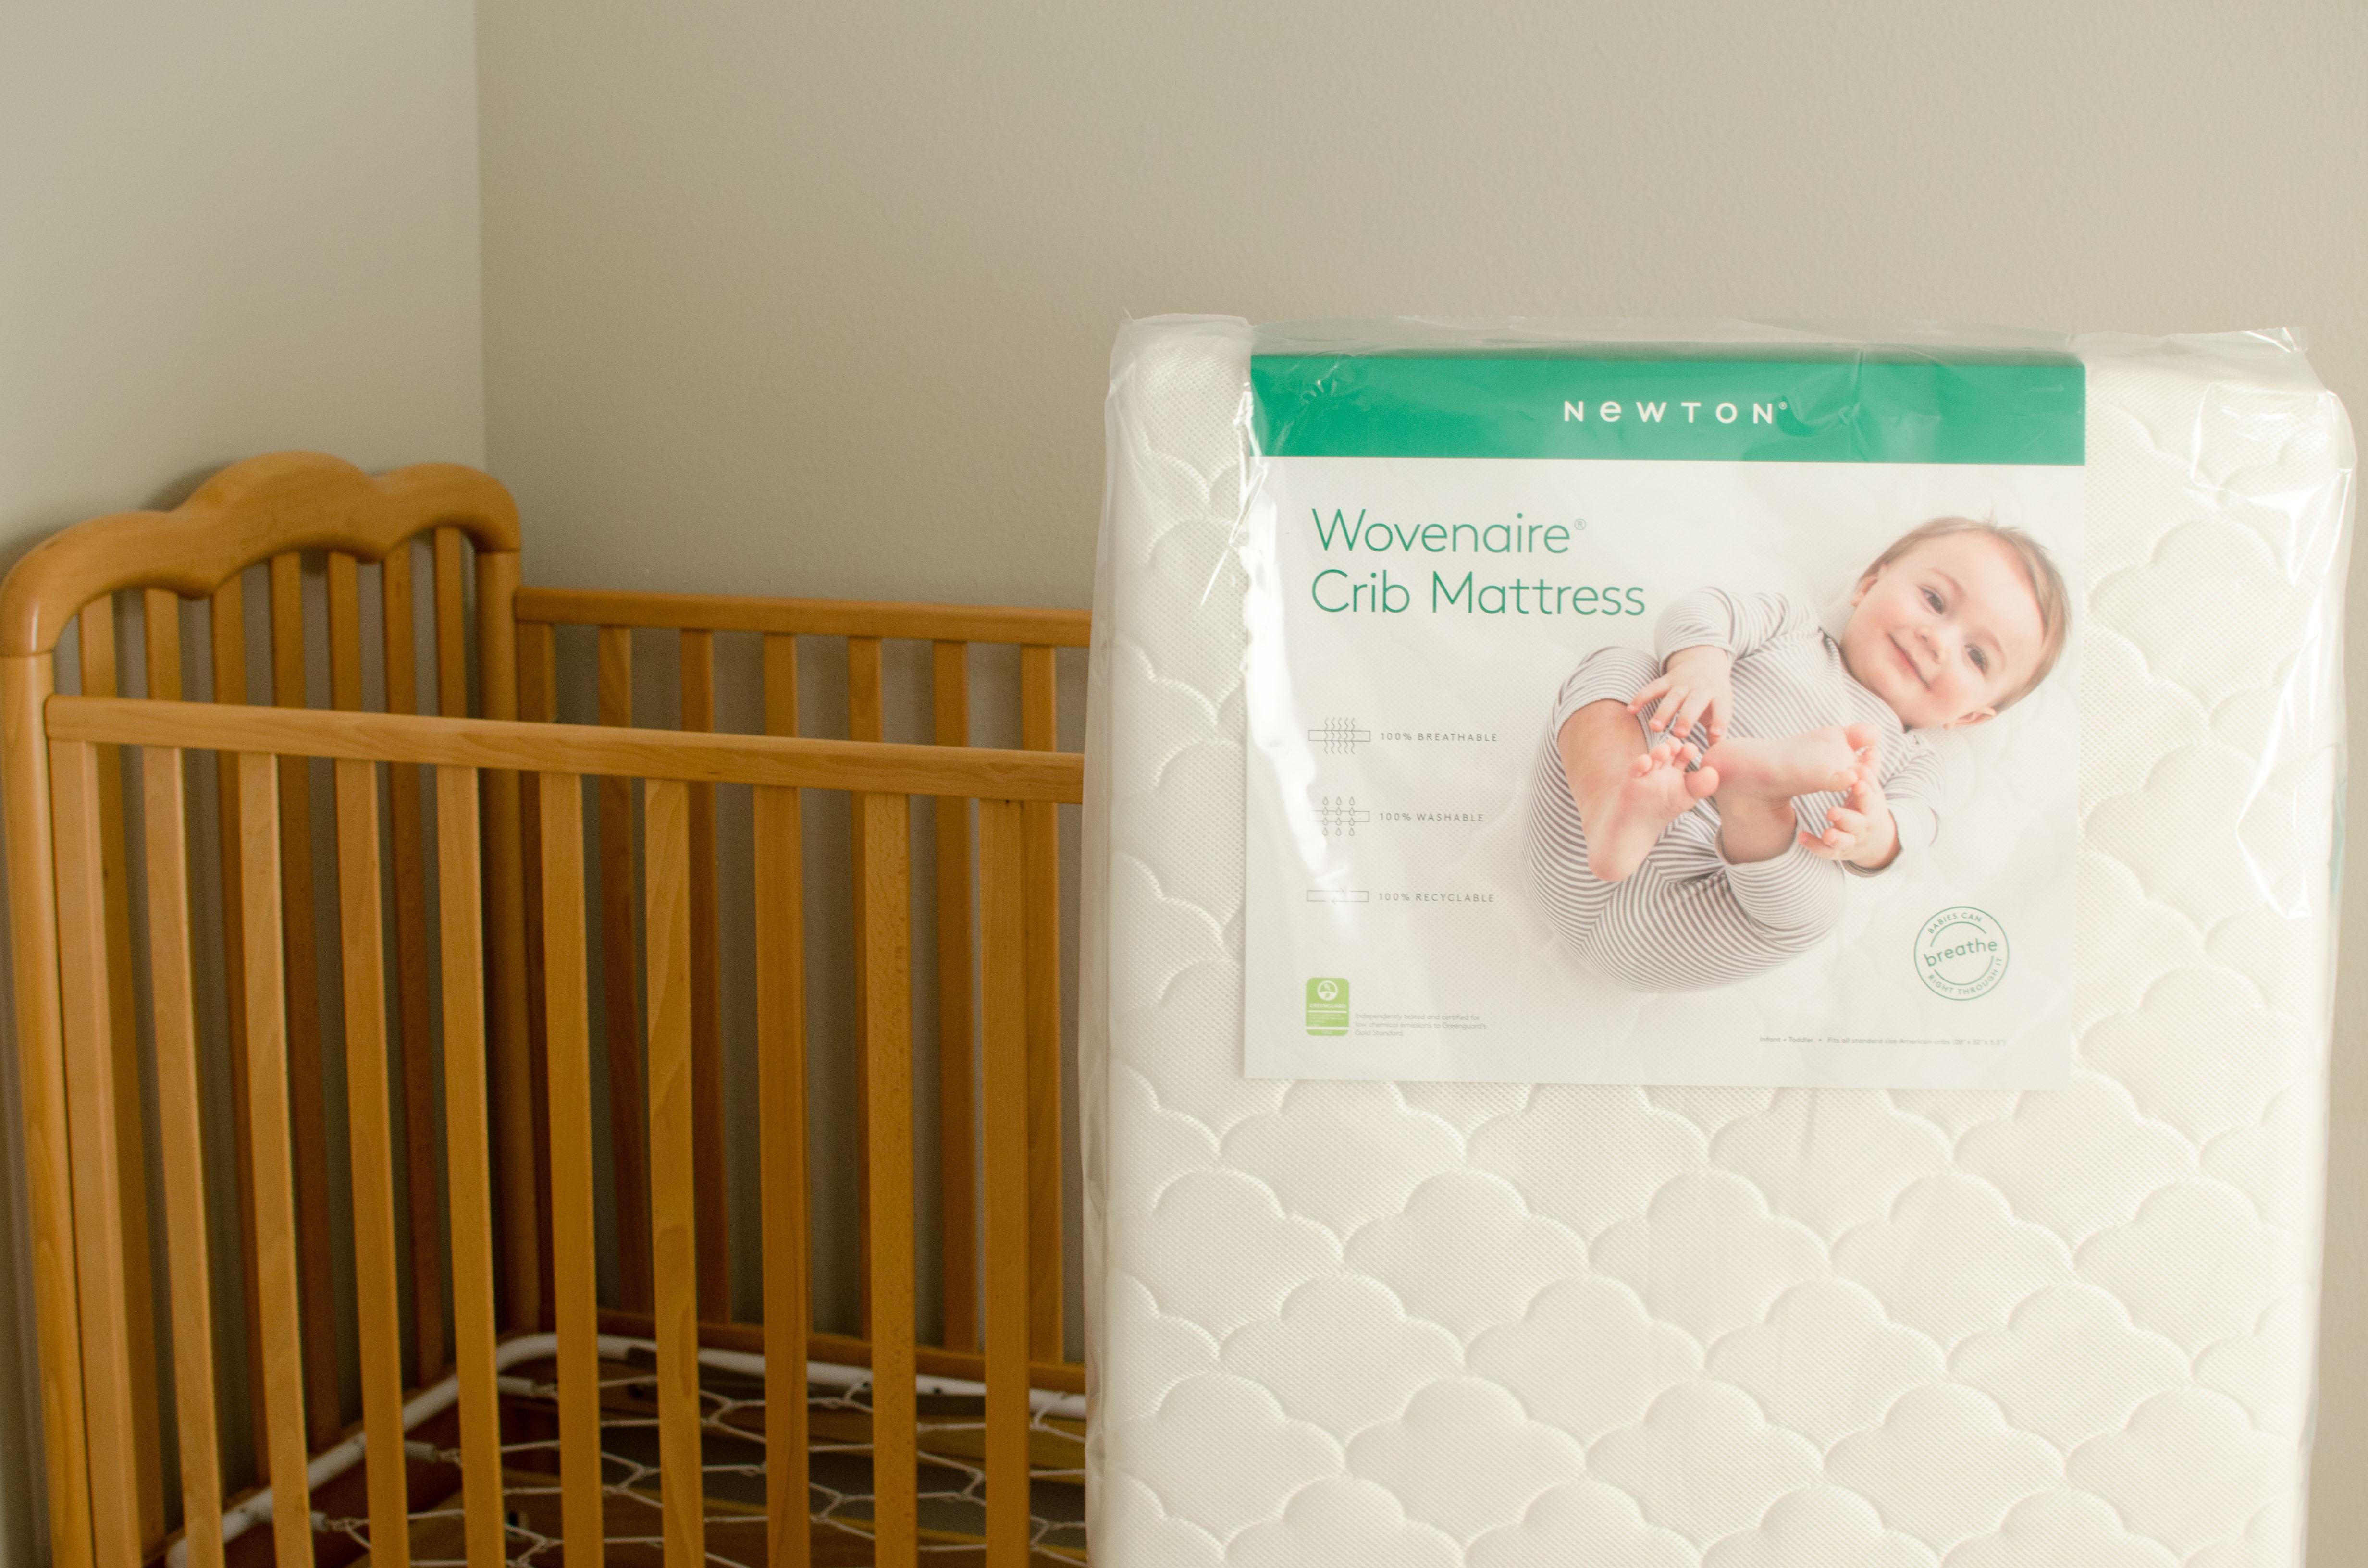 Newton Baby Wovenaire Crib Mattress